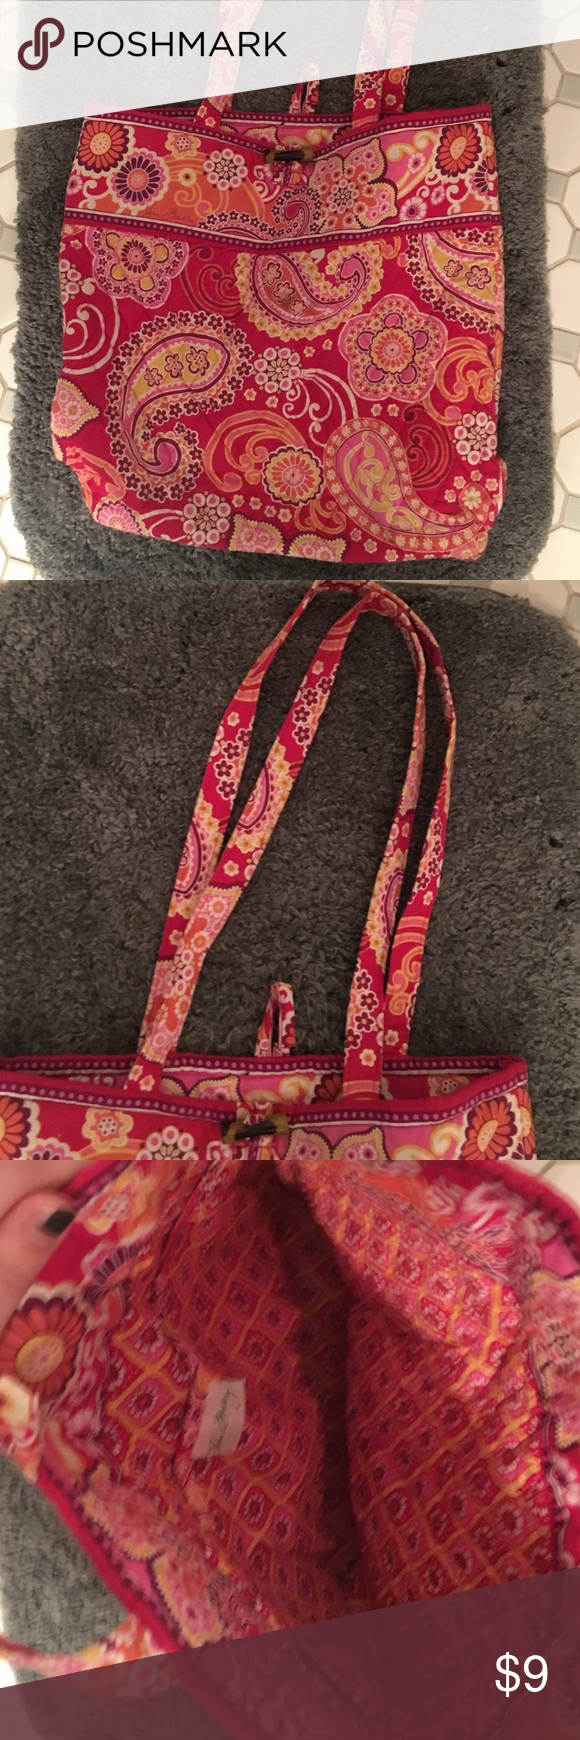 Vera Bradley raspberry fizz bag Original. Perfect condition. Vera Bradley Bags Totes